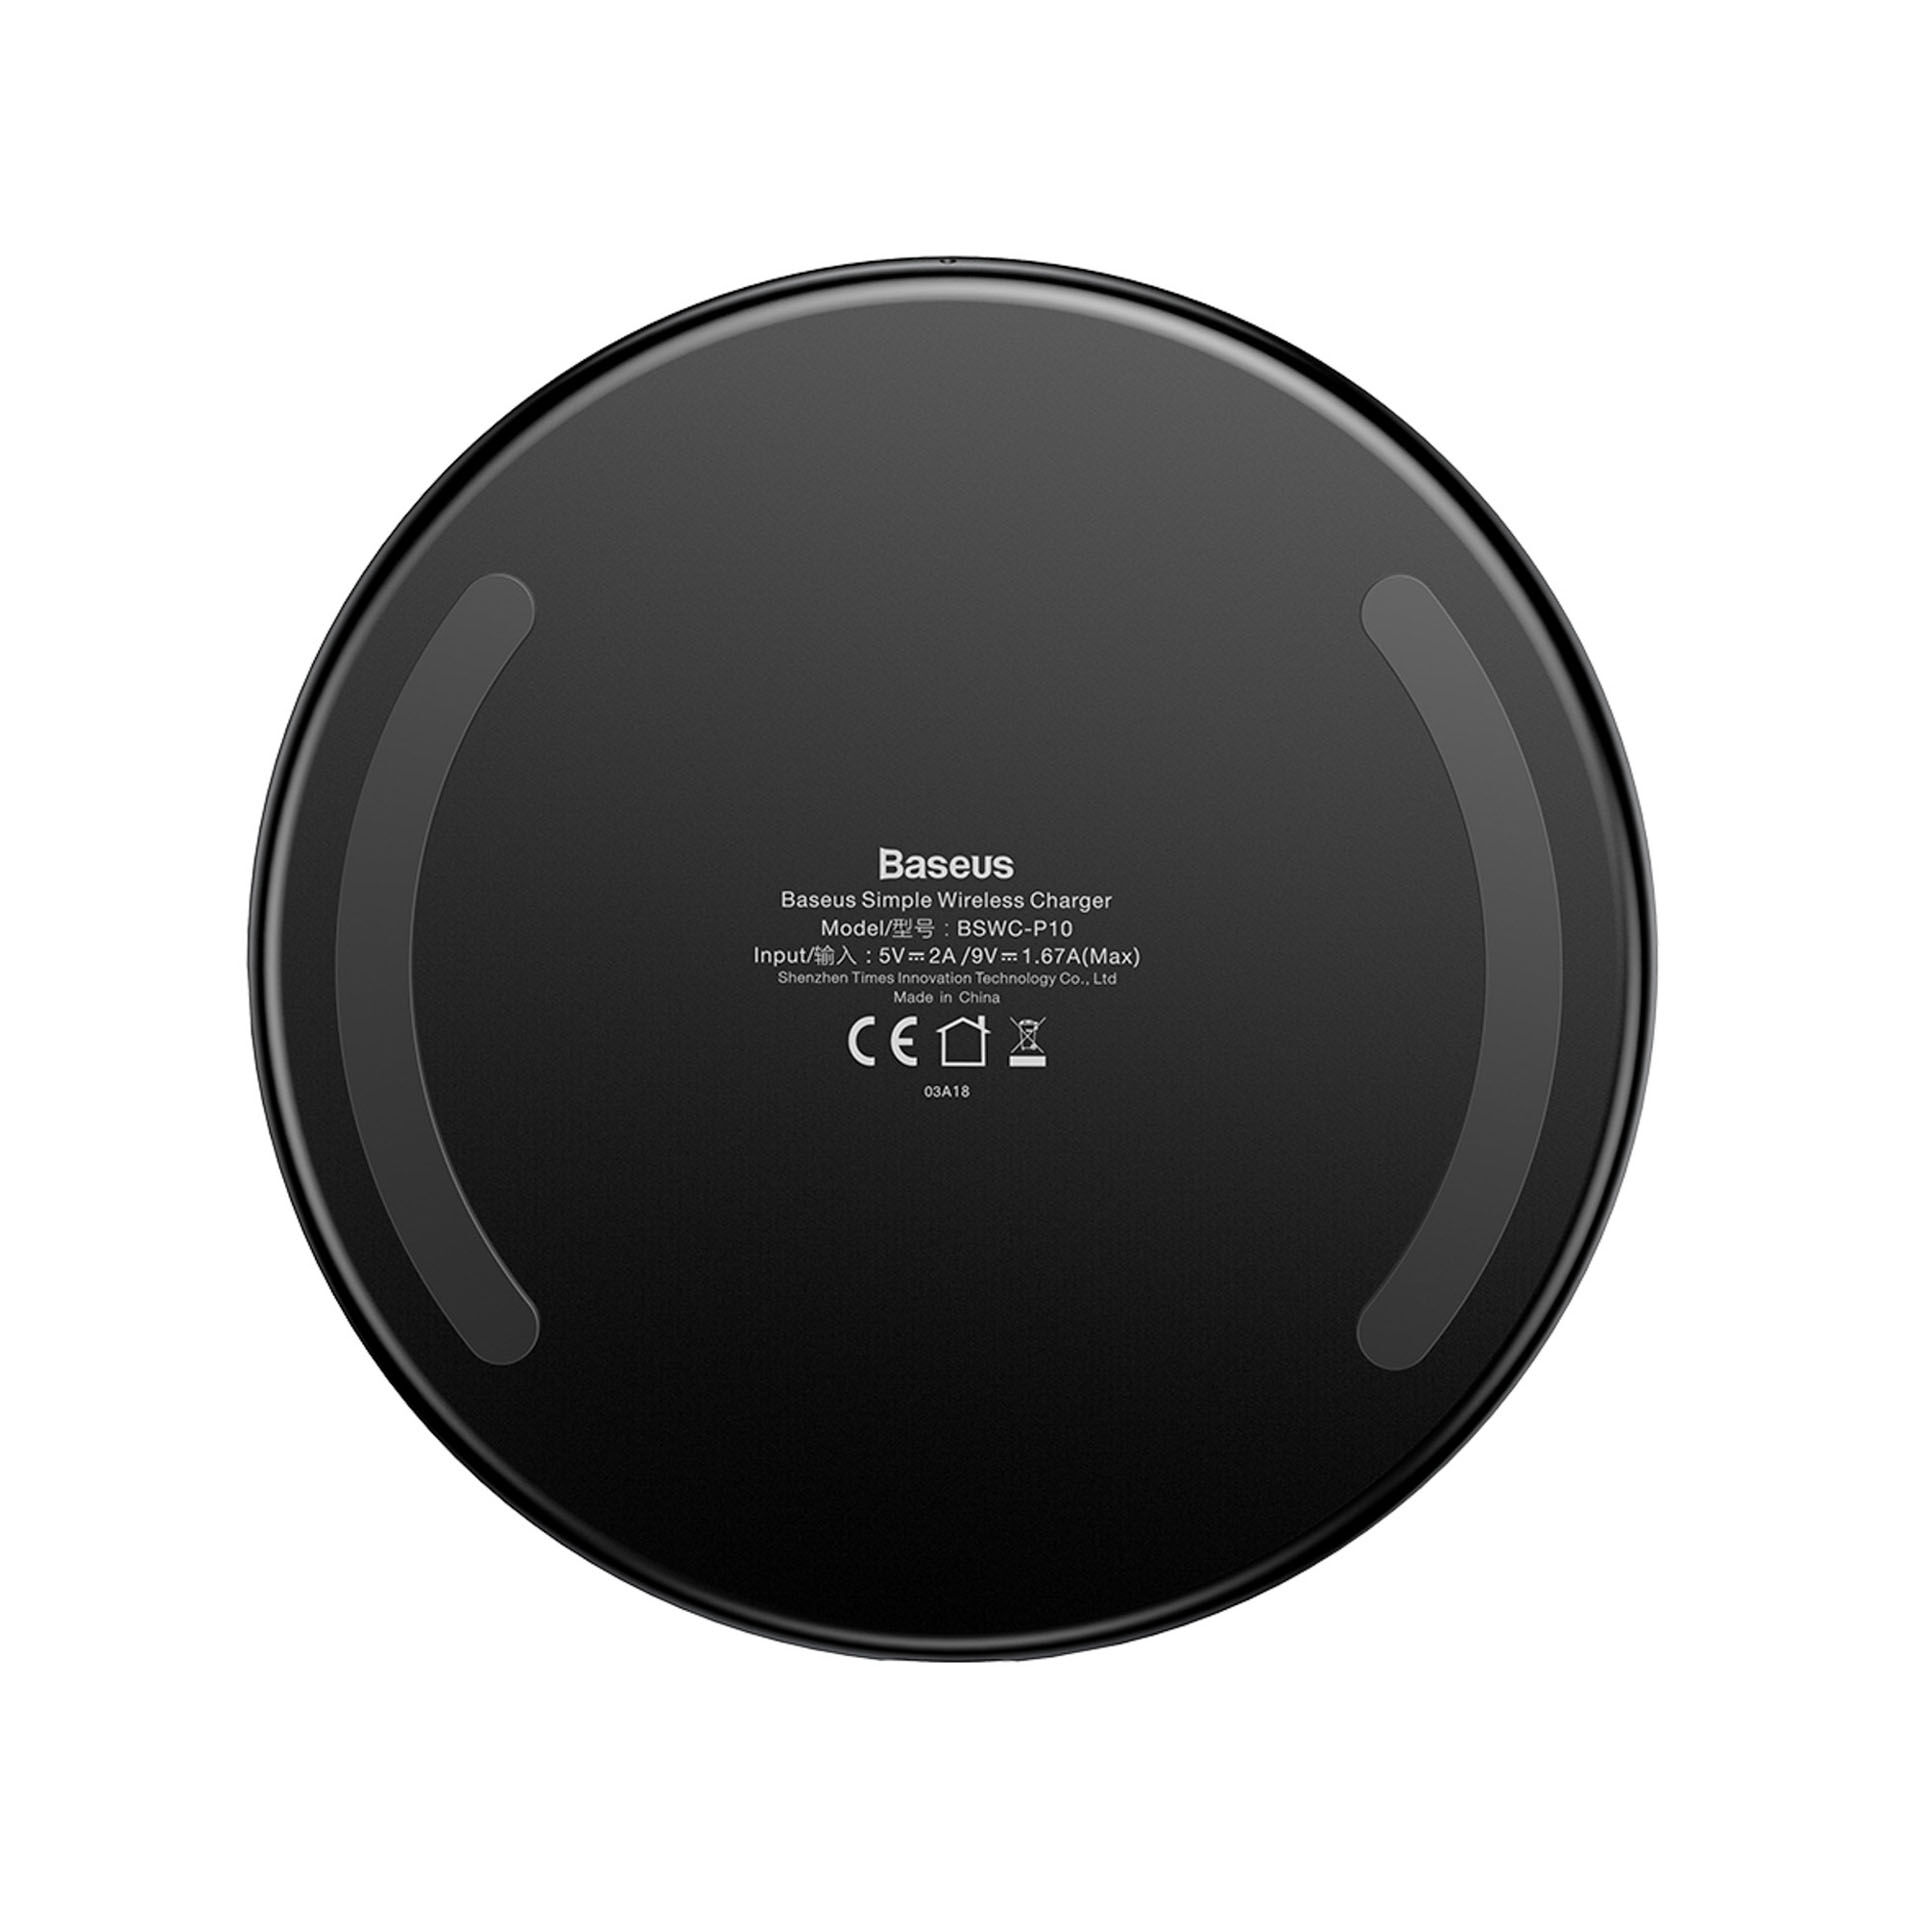 miniatura 21 - Caricabatterie wireless ultra sottile per smartphone